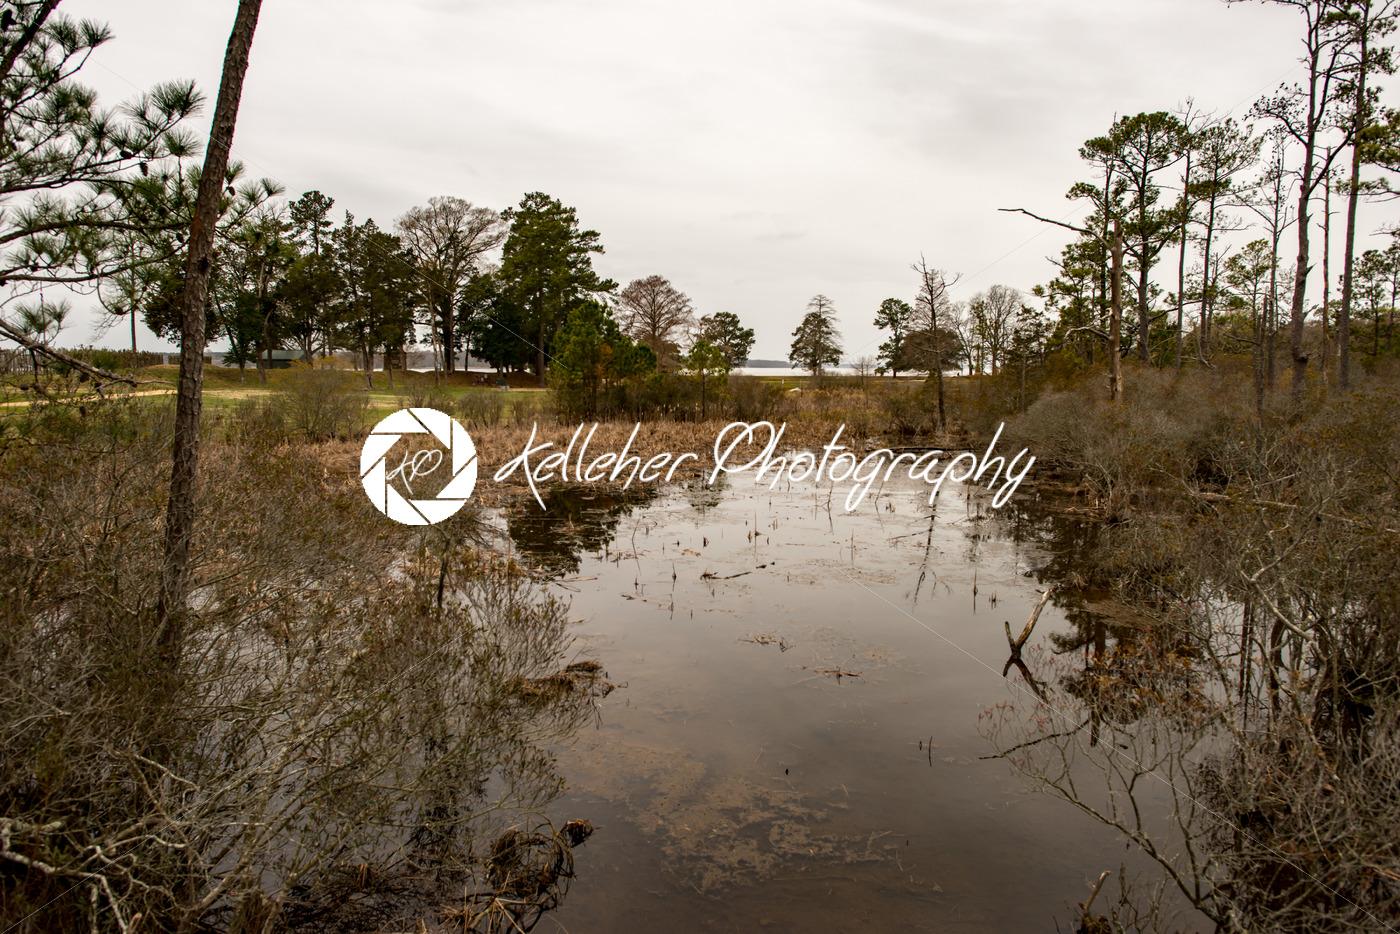 Swamp lake and trees in Jamestown, Virginia - Kelleher Photography Store